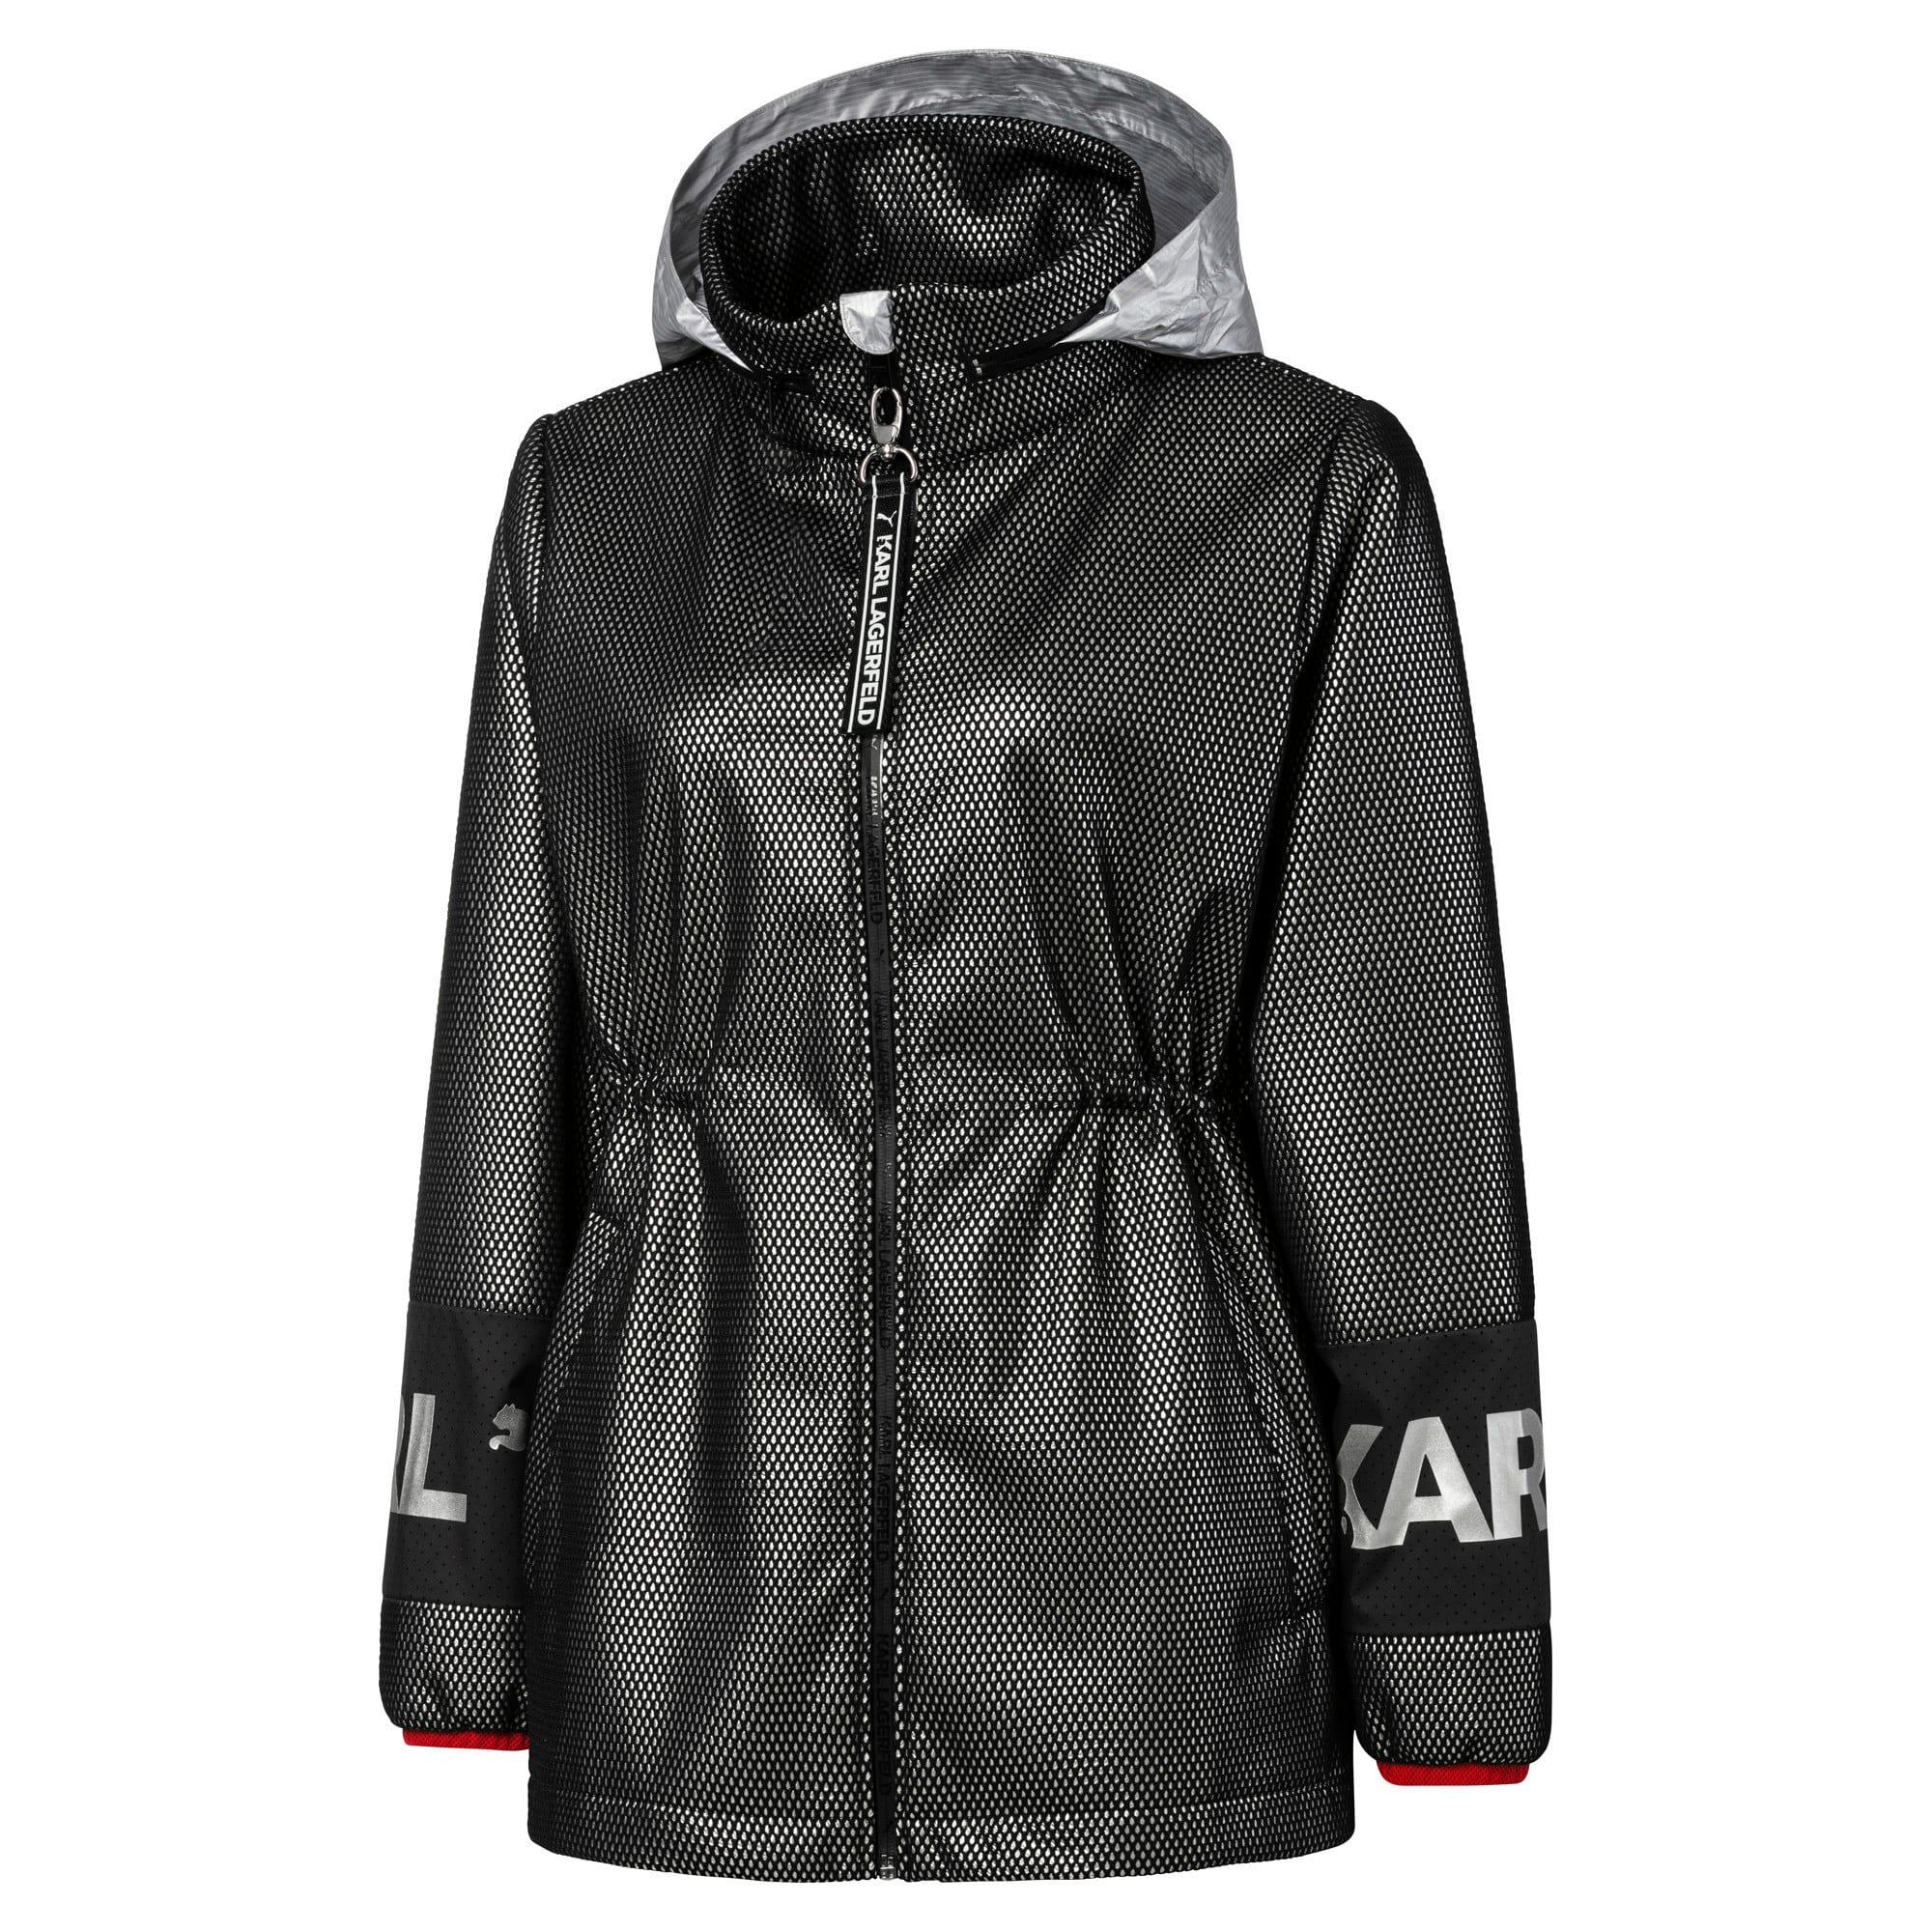 Thumbnail 9 of PUMA x KARL LAGERFELD Women's Outerwear Jacket, Puma Black, medium